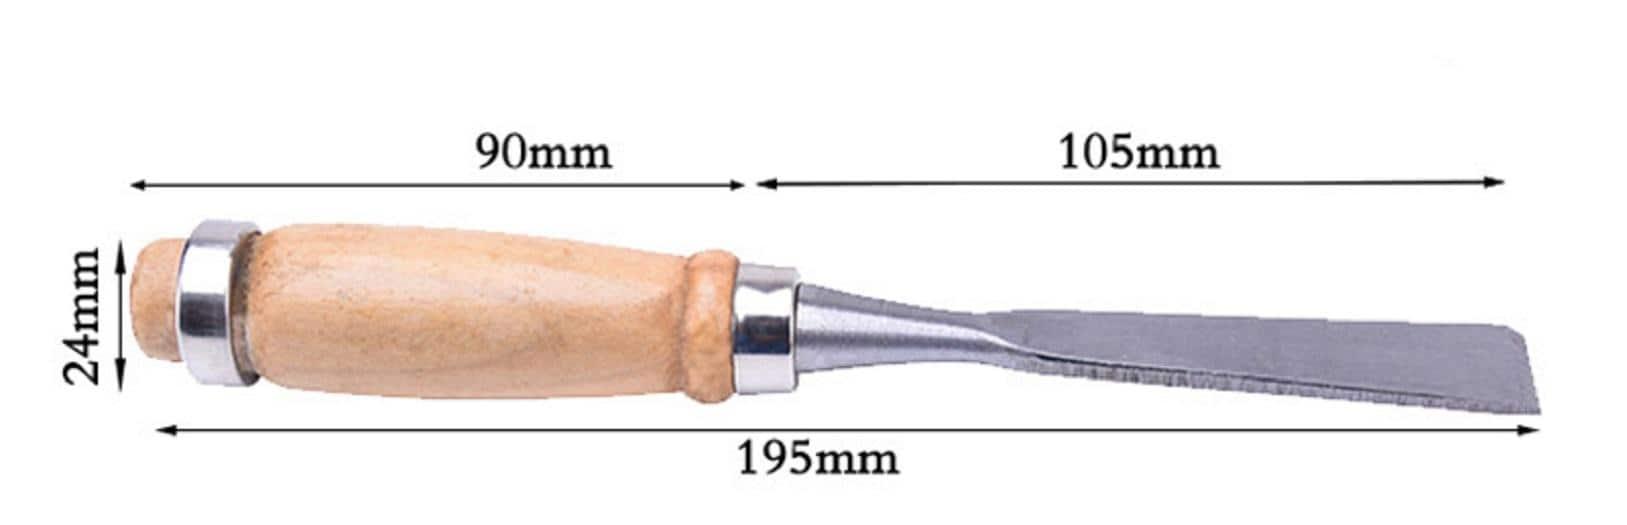 4artz® 12-delige gutsen / steekbeitelset - houtbewerking - 19,5cm lang